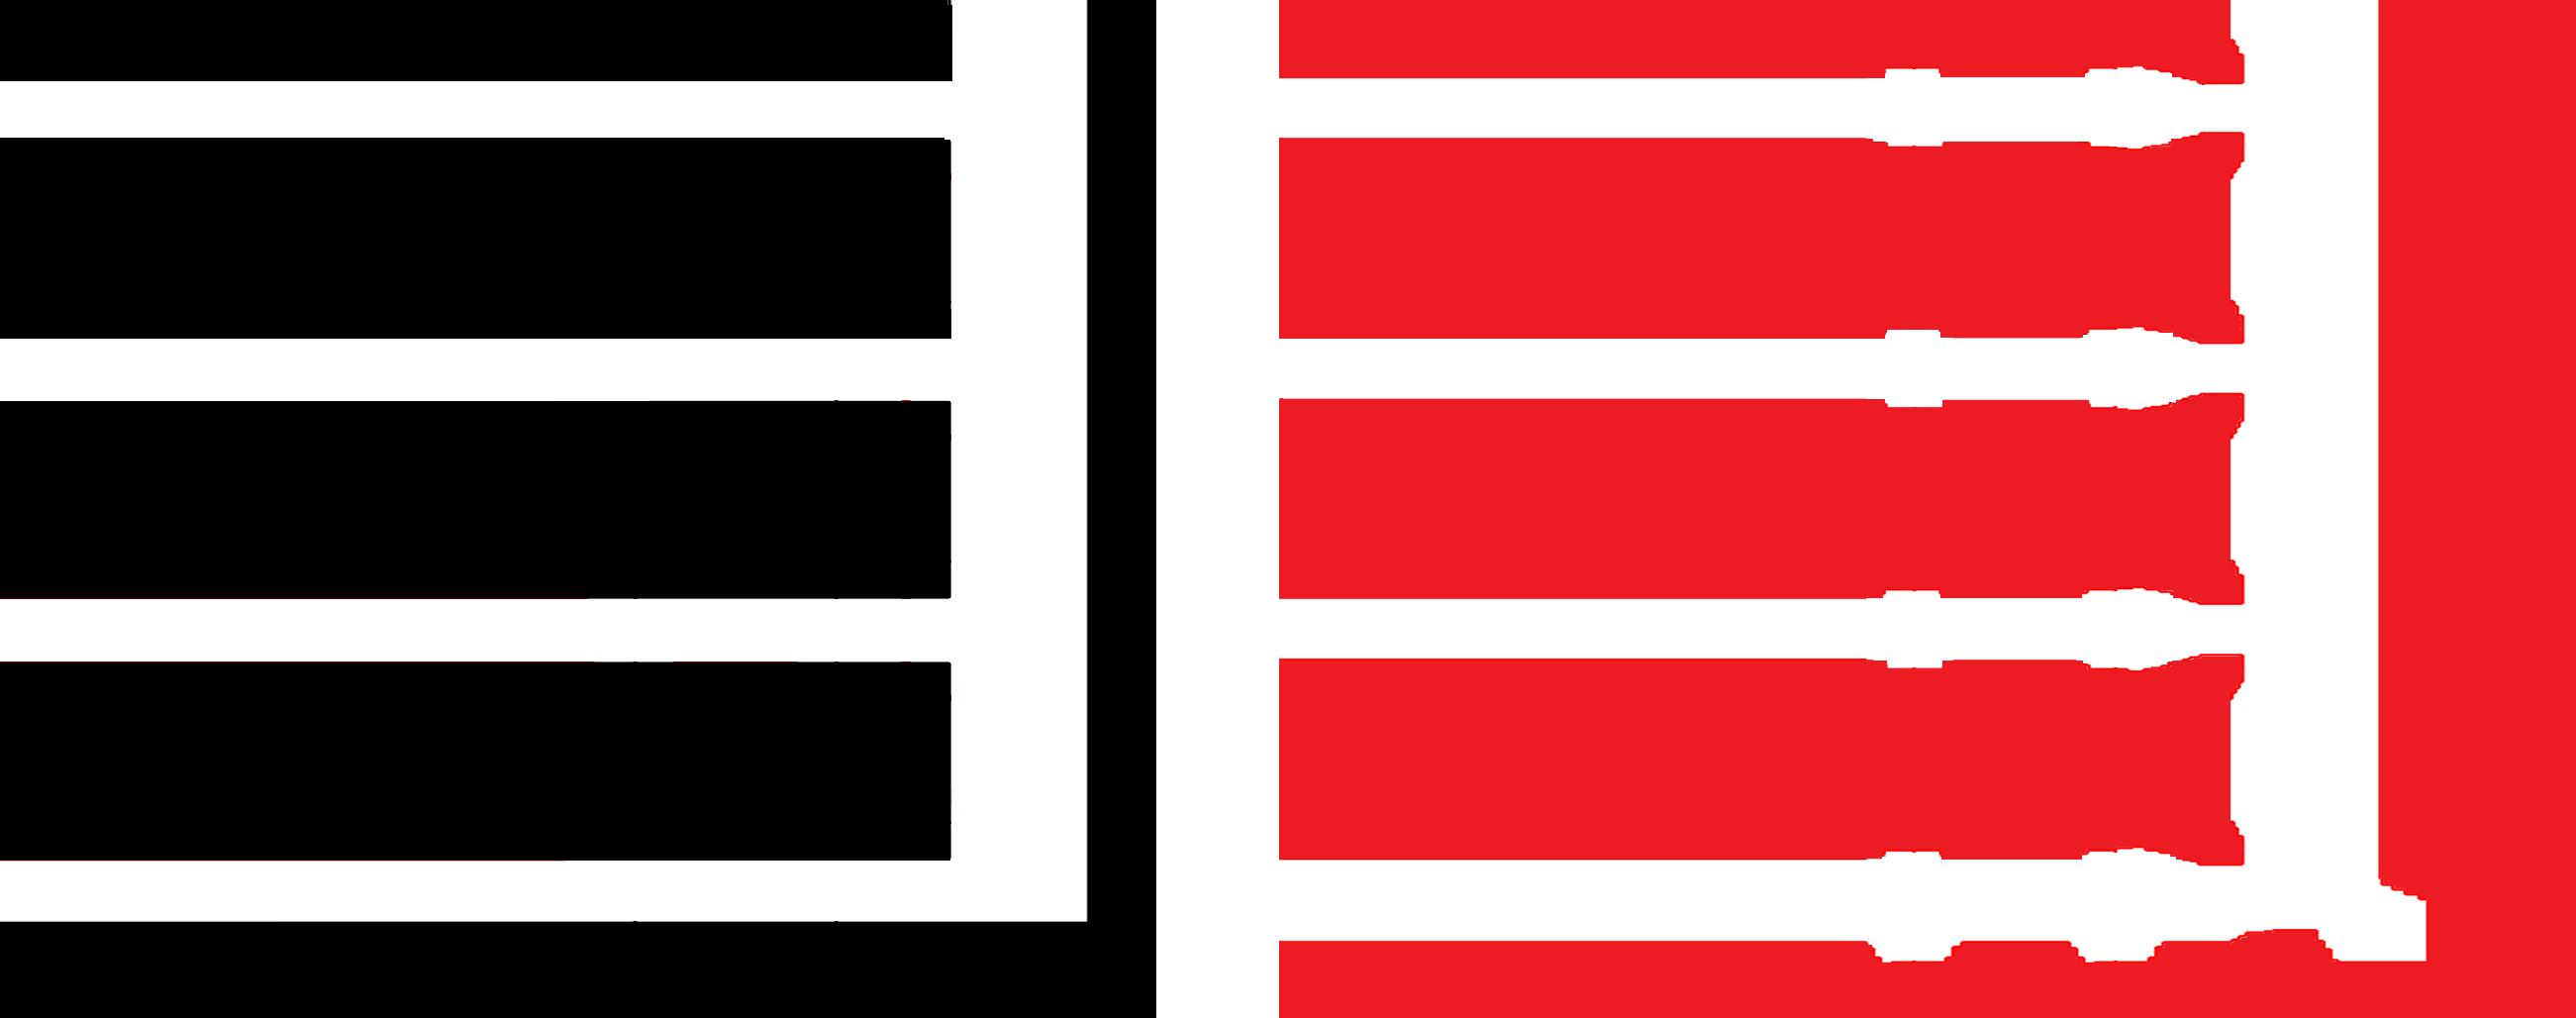 LDE Image